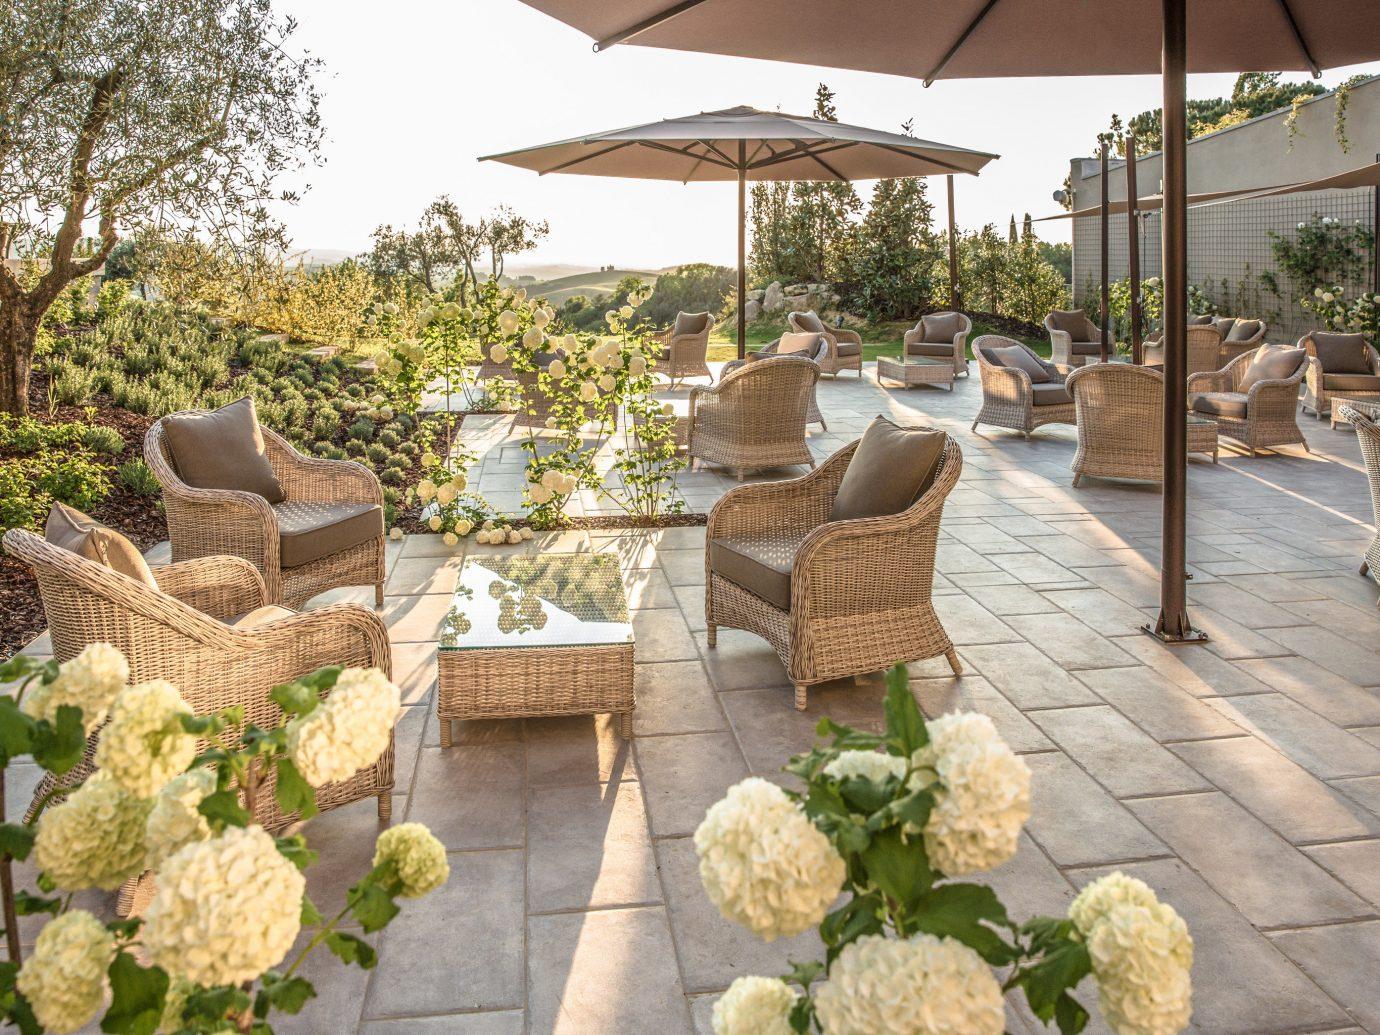 Trip Ideas outdoor ground property backyard floristry Courtyard Resort Garden estate yard flower furniture landscape architect outdoor structure area stone